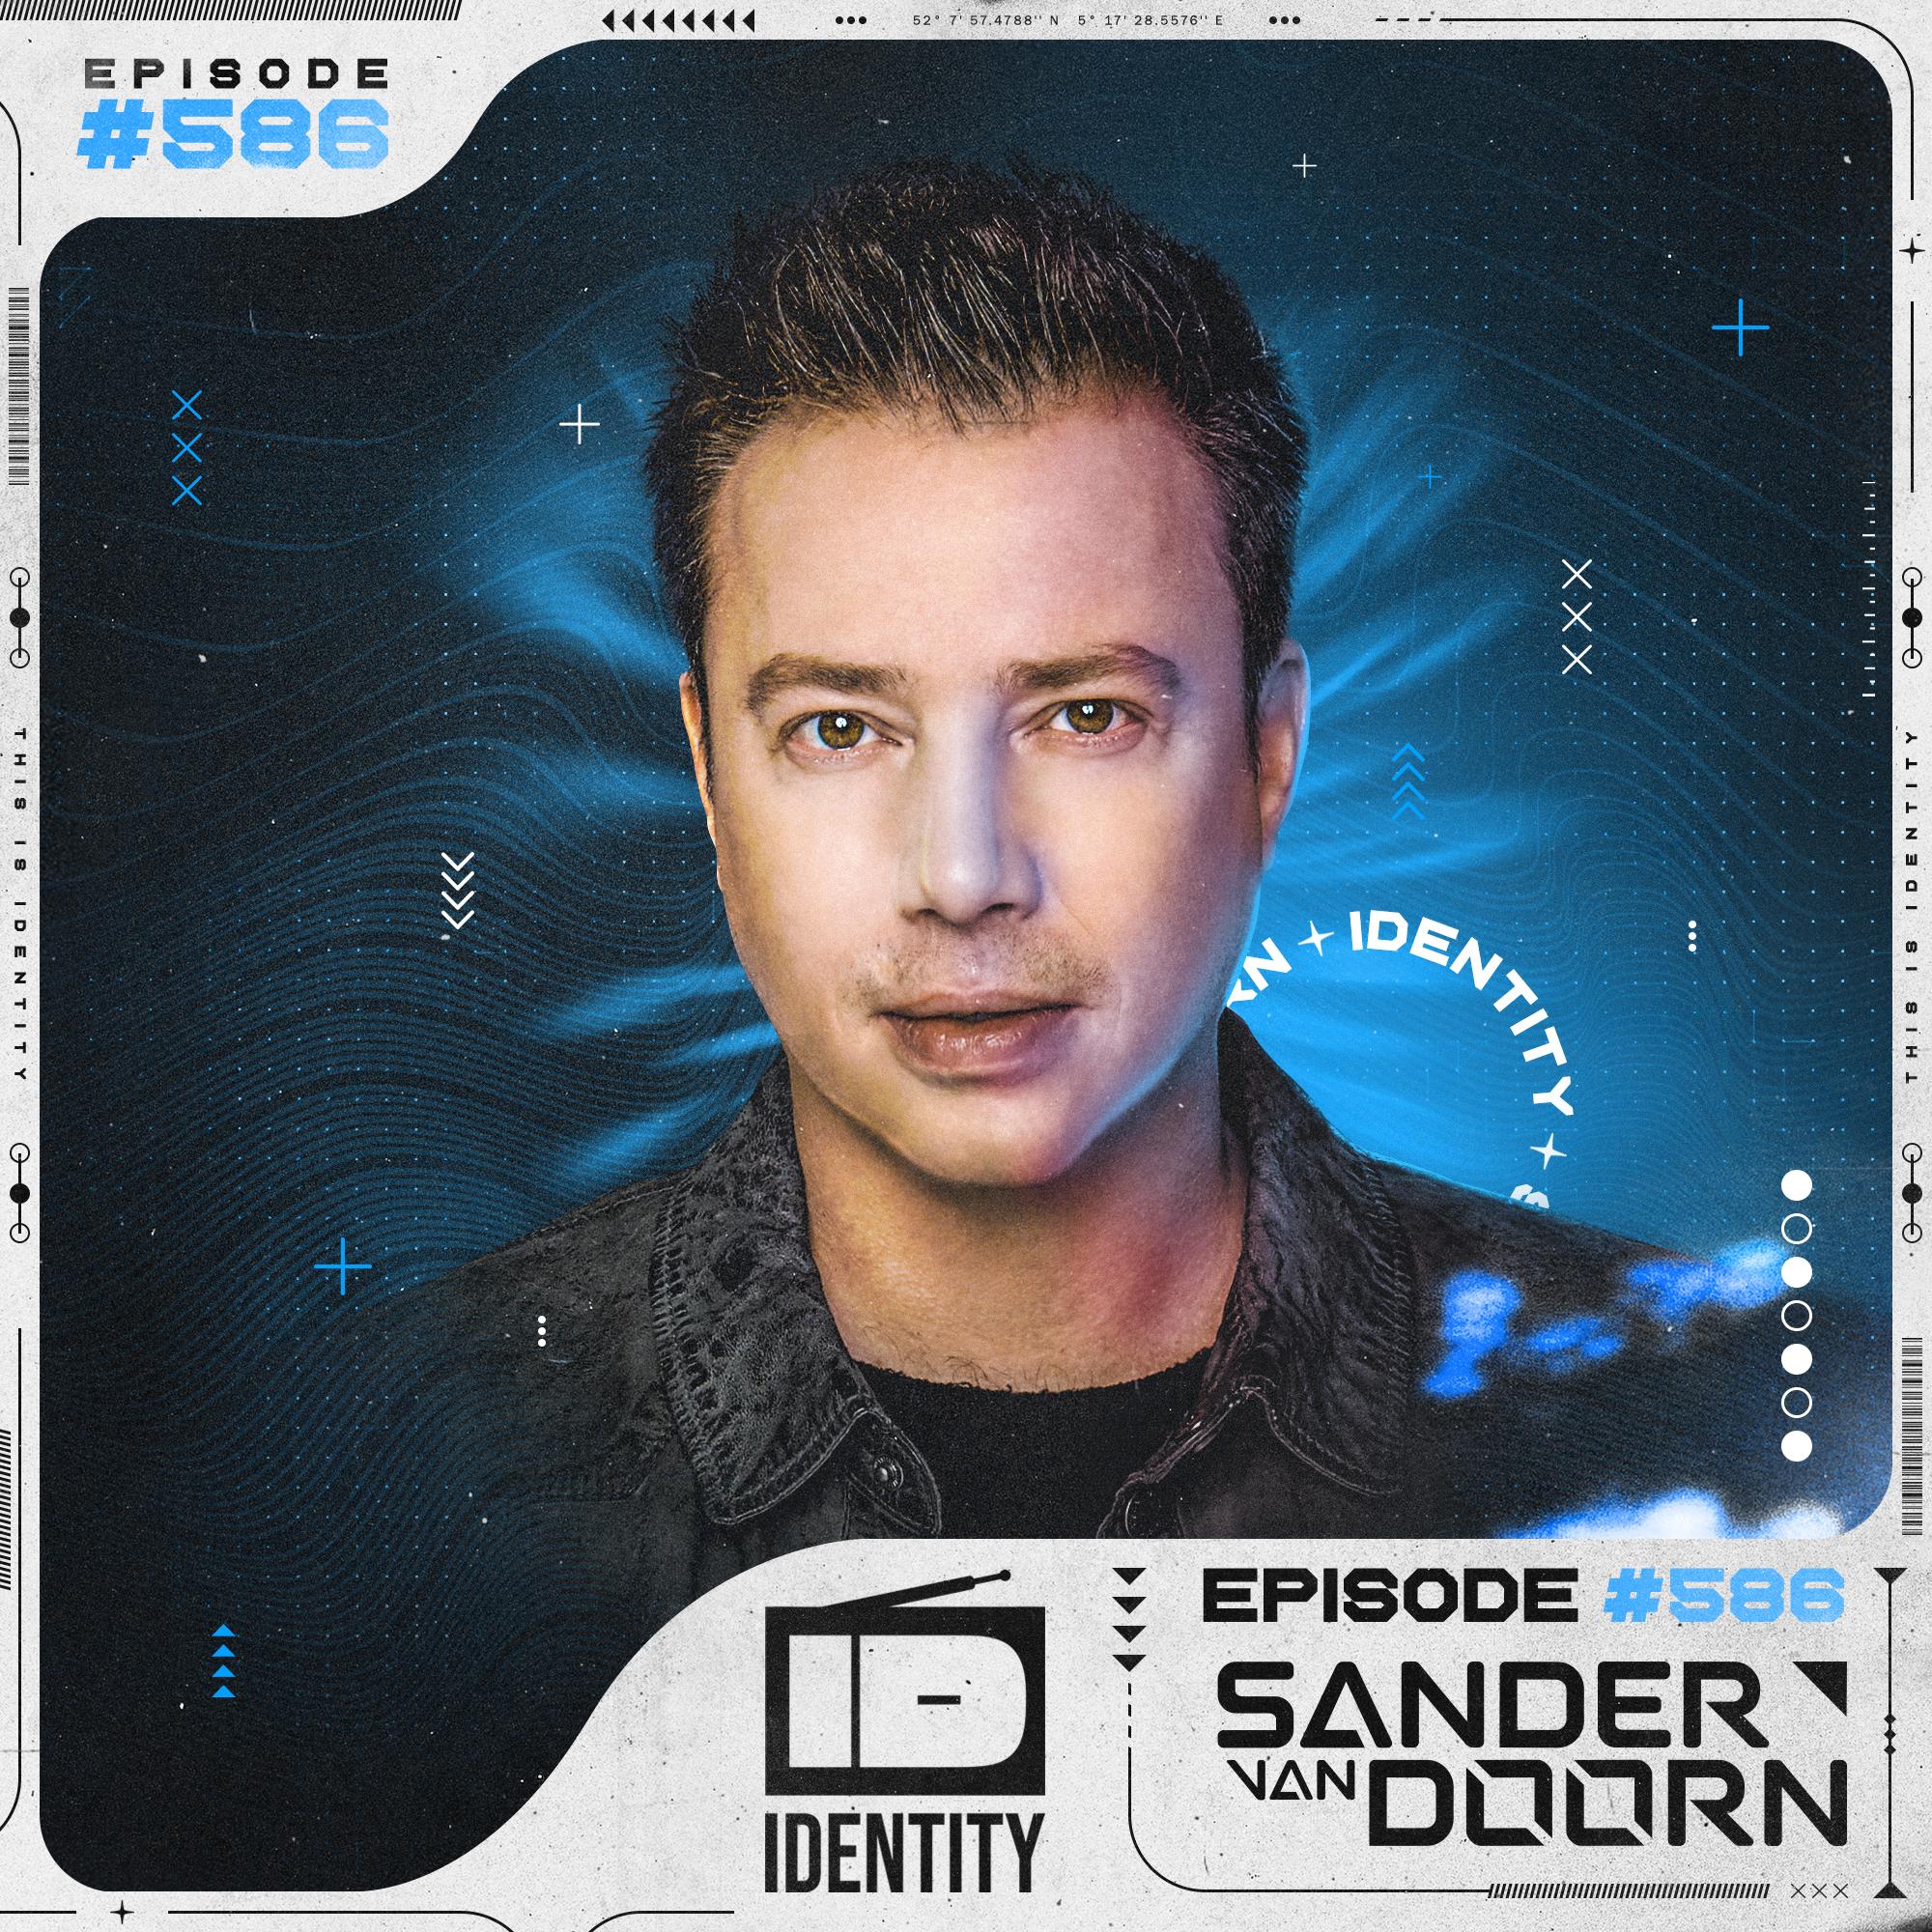 Identity 586